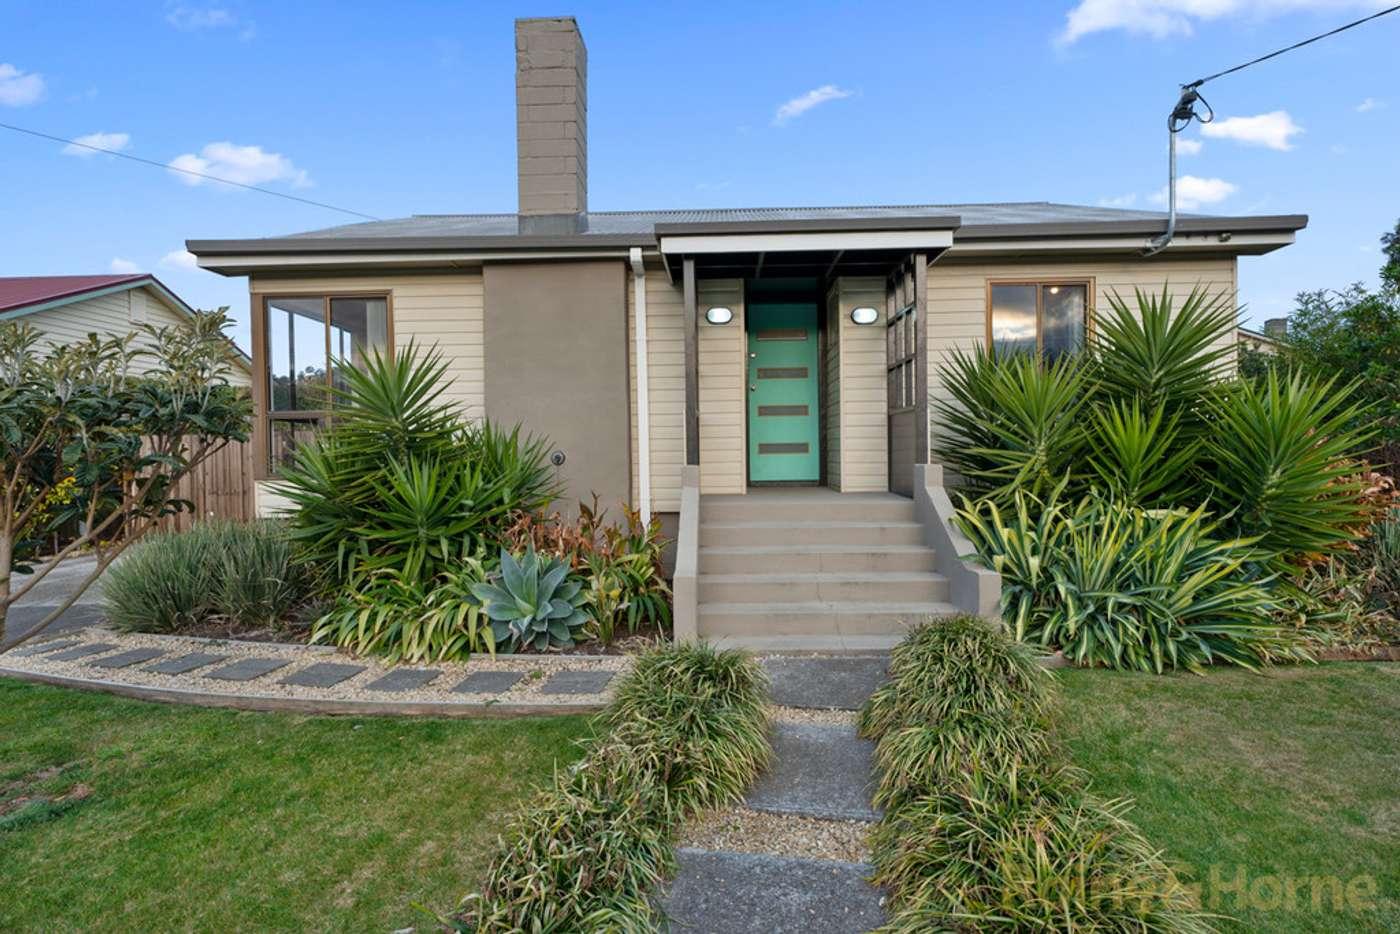 Main view of Homely house listing, 63 Bligh Street, Warrane TAS 7018